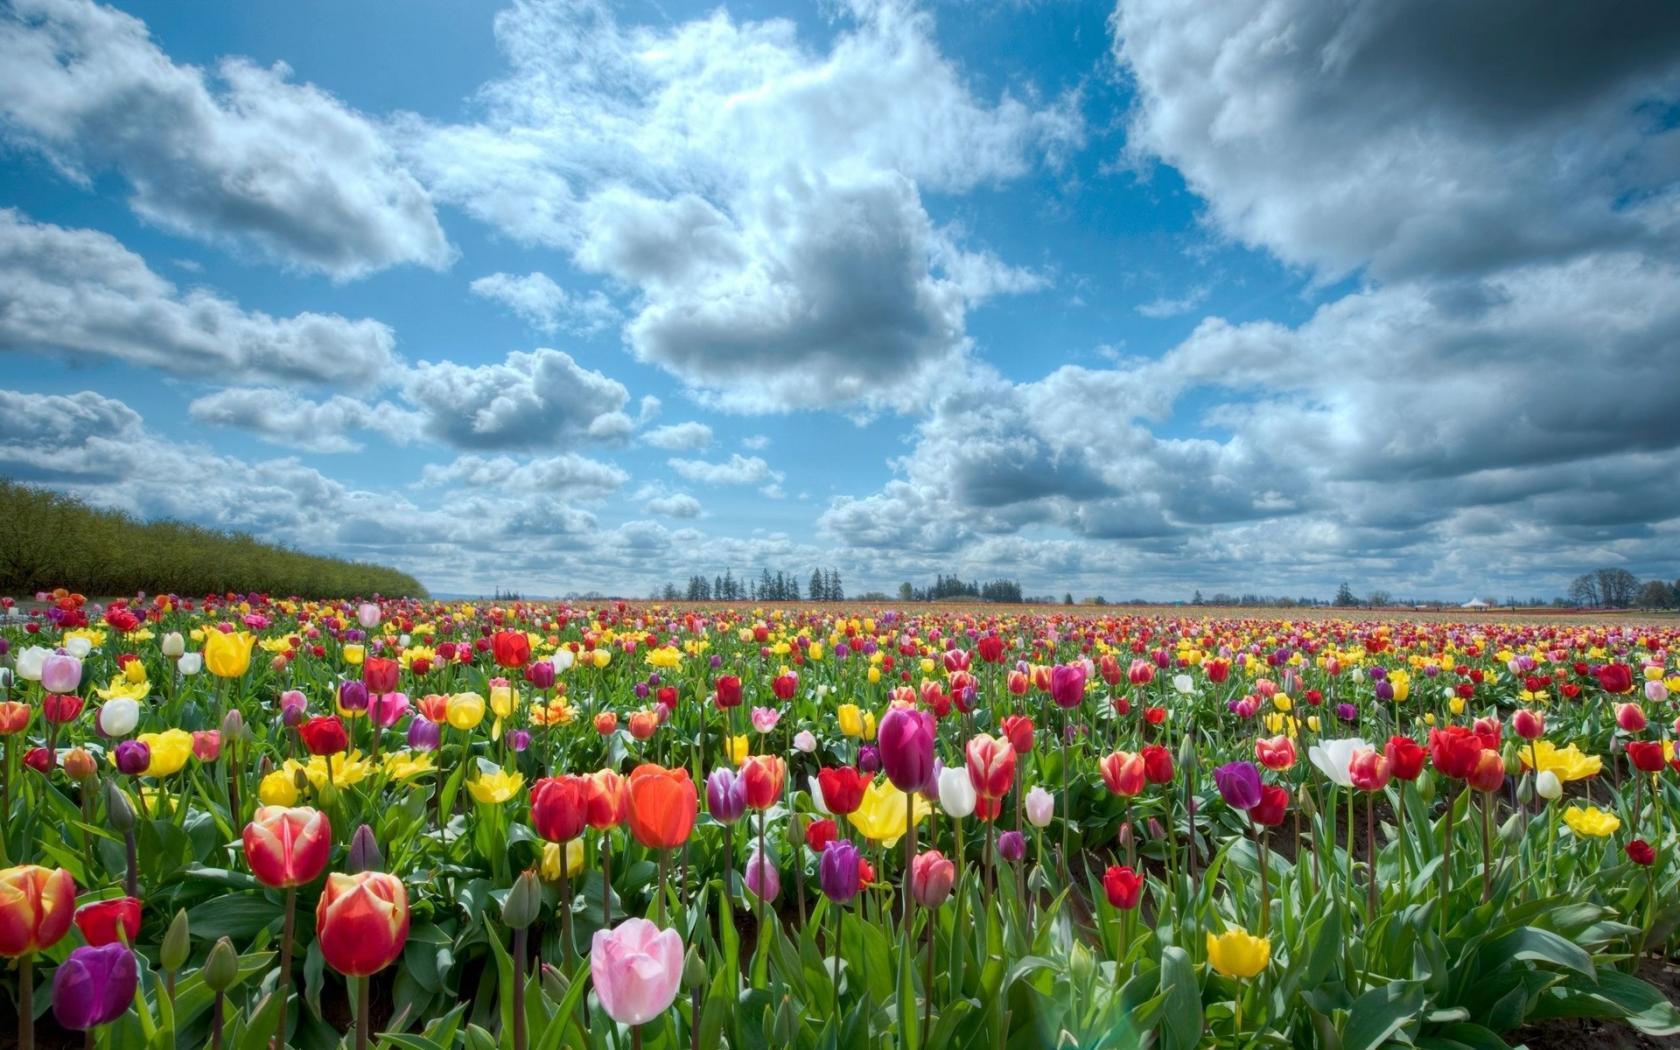 Природа, поле, небо, тюльпаны обои для ...: hq-wallpapers.ru/wallpapers/flowers/pic49408_raz1680x1050